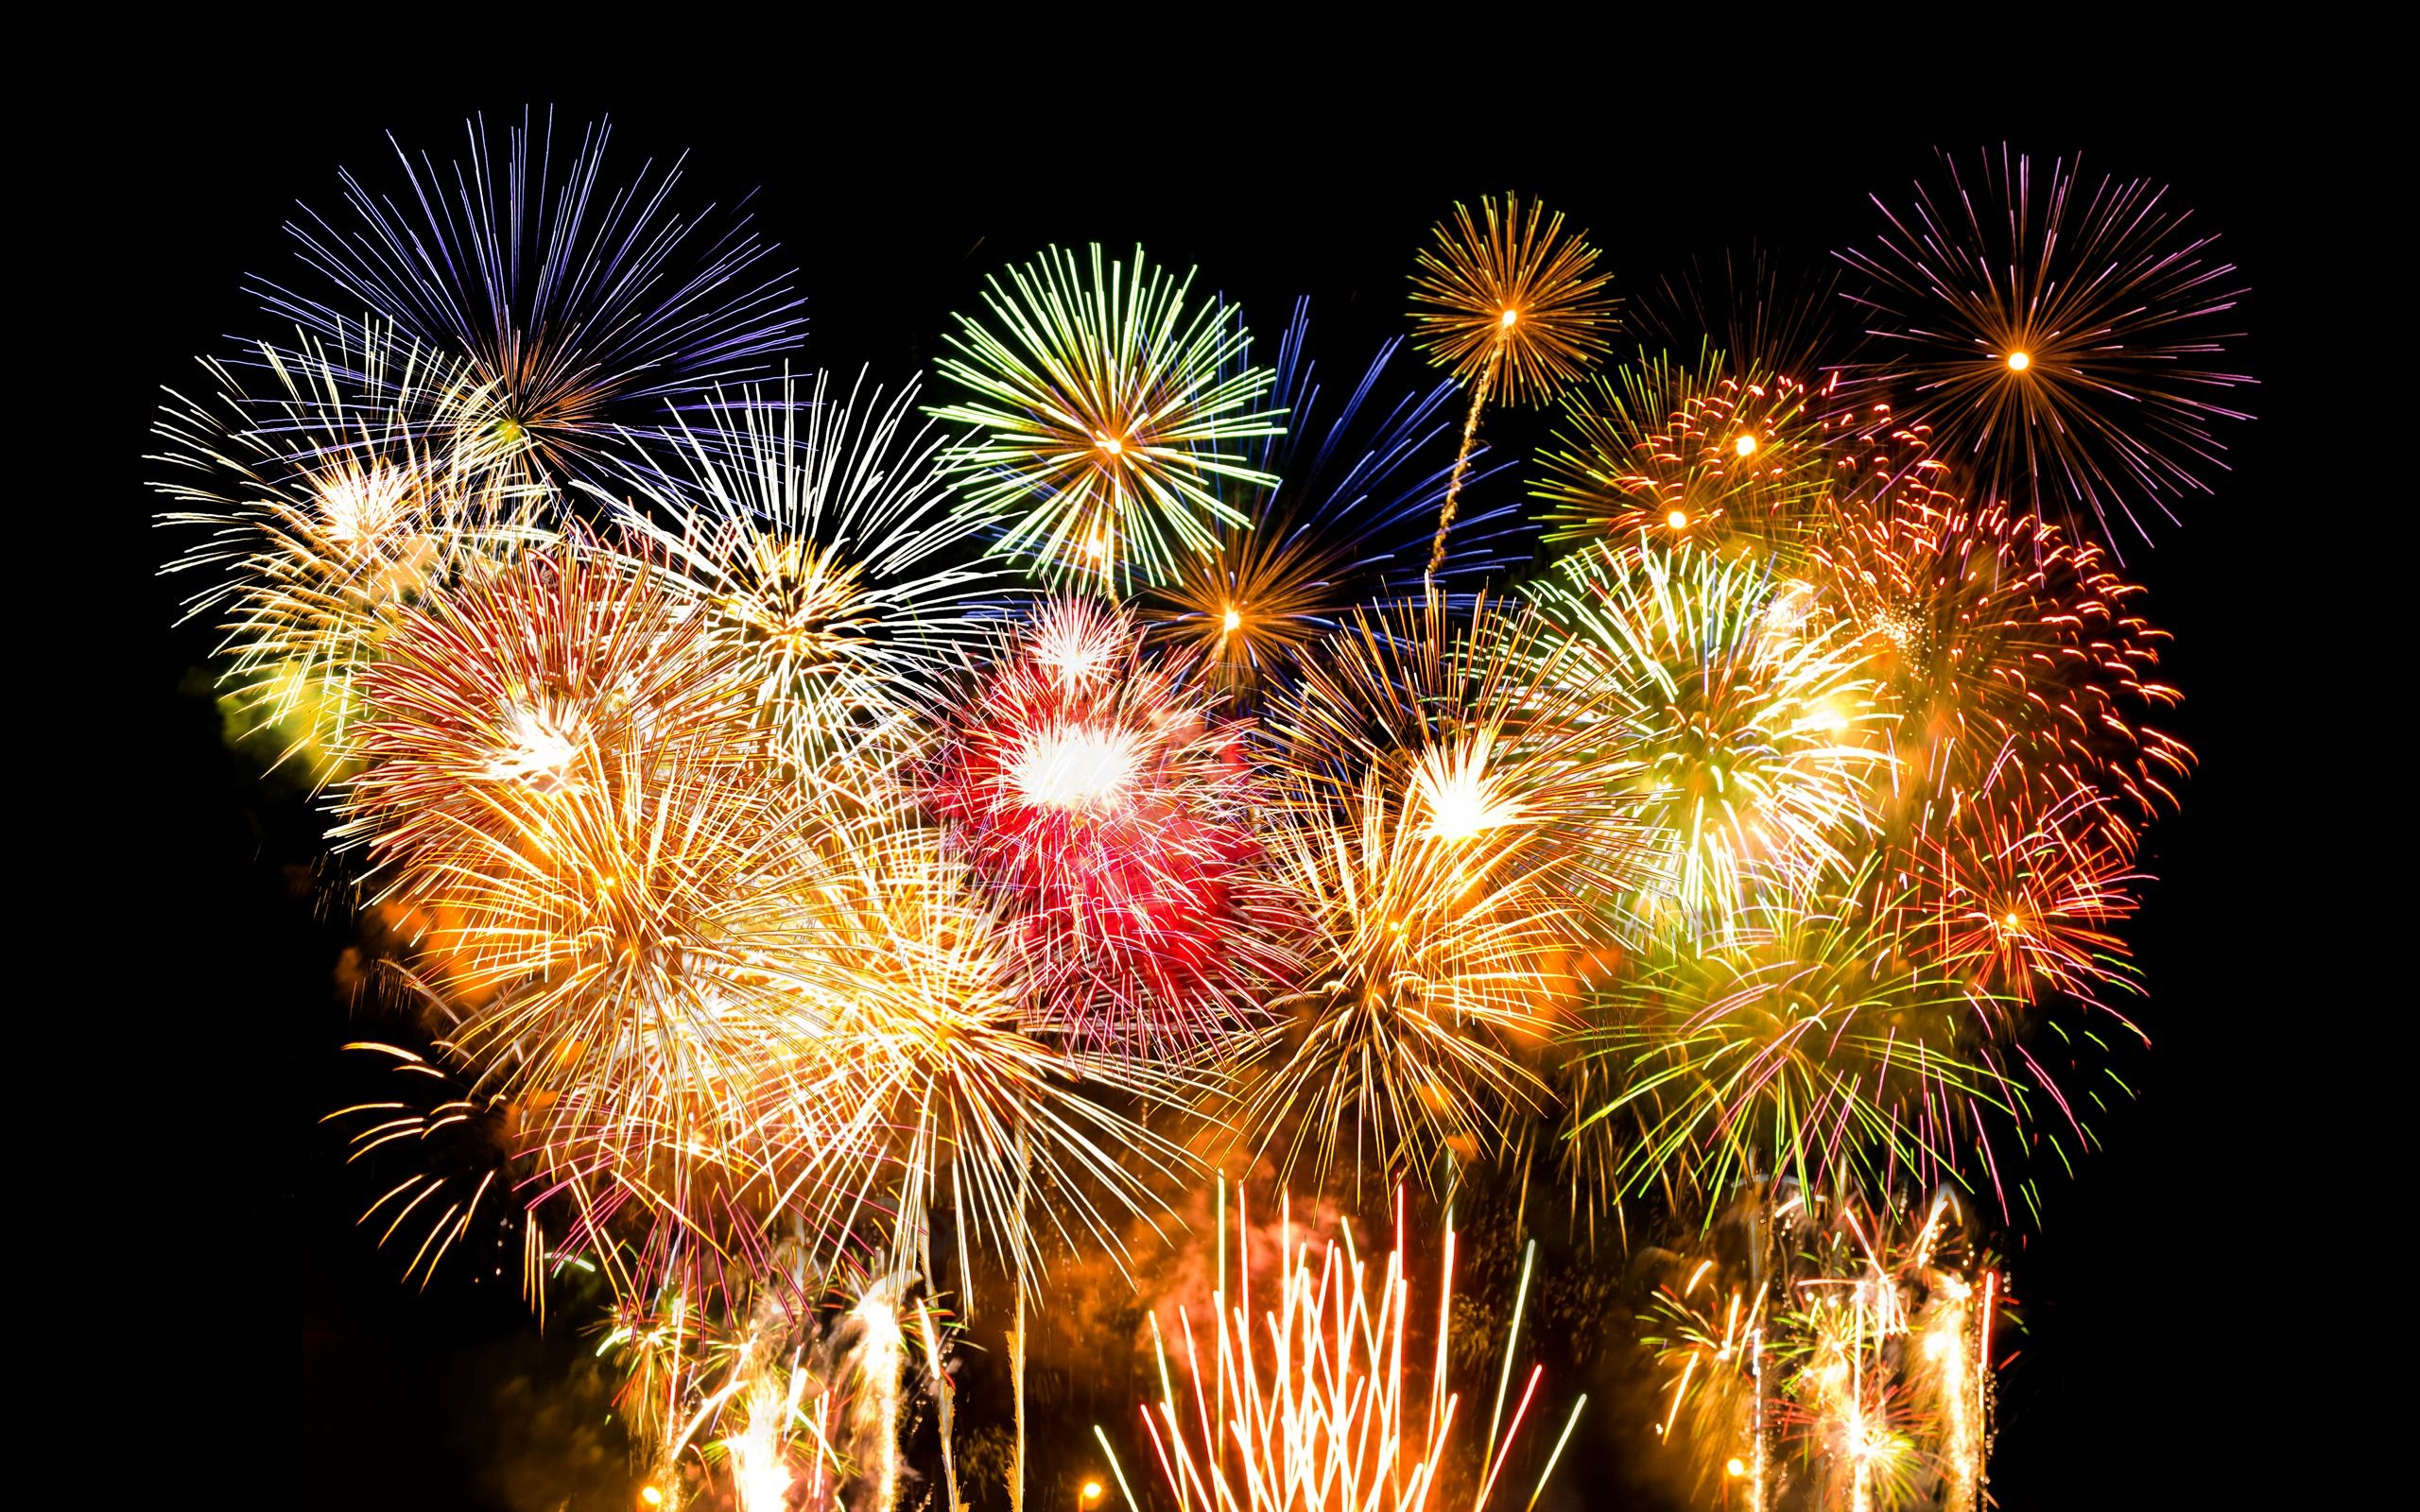 Fireworks Wallpaper Free: Firework Wallpaper Desktop Background